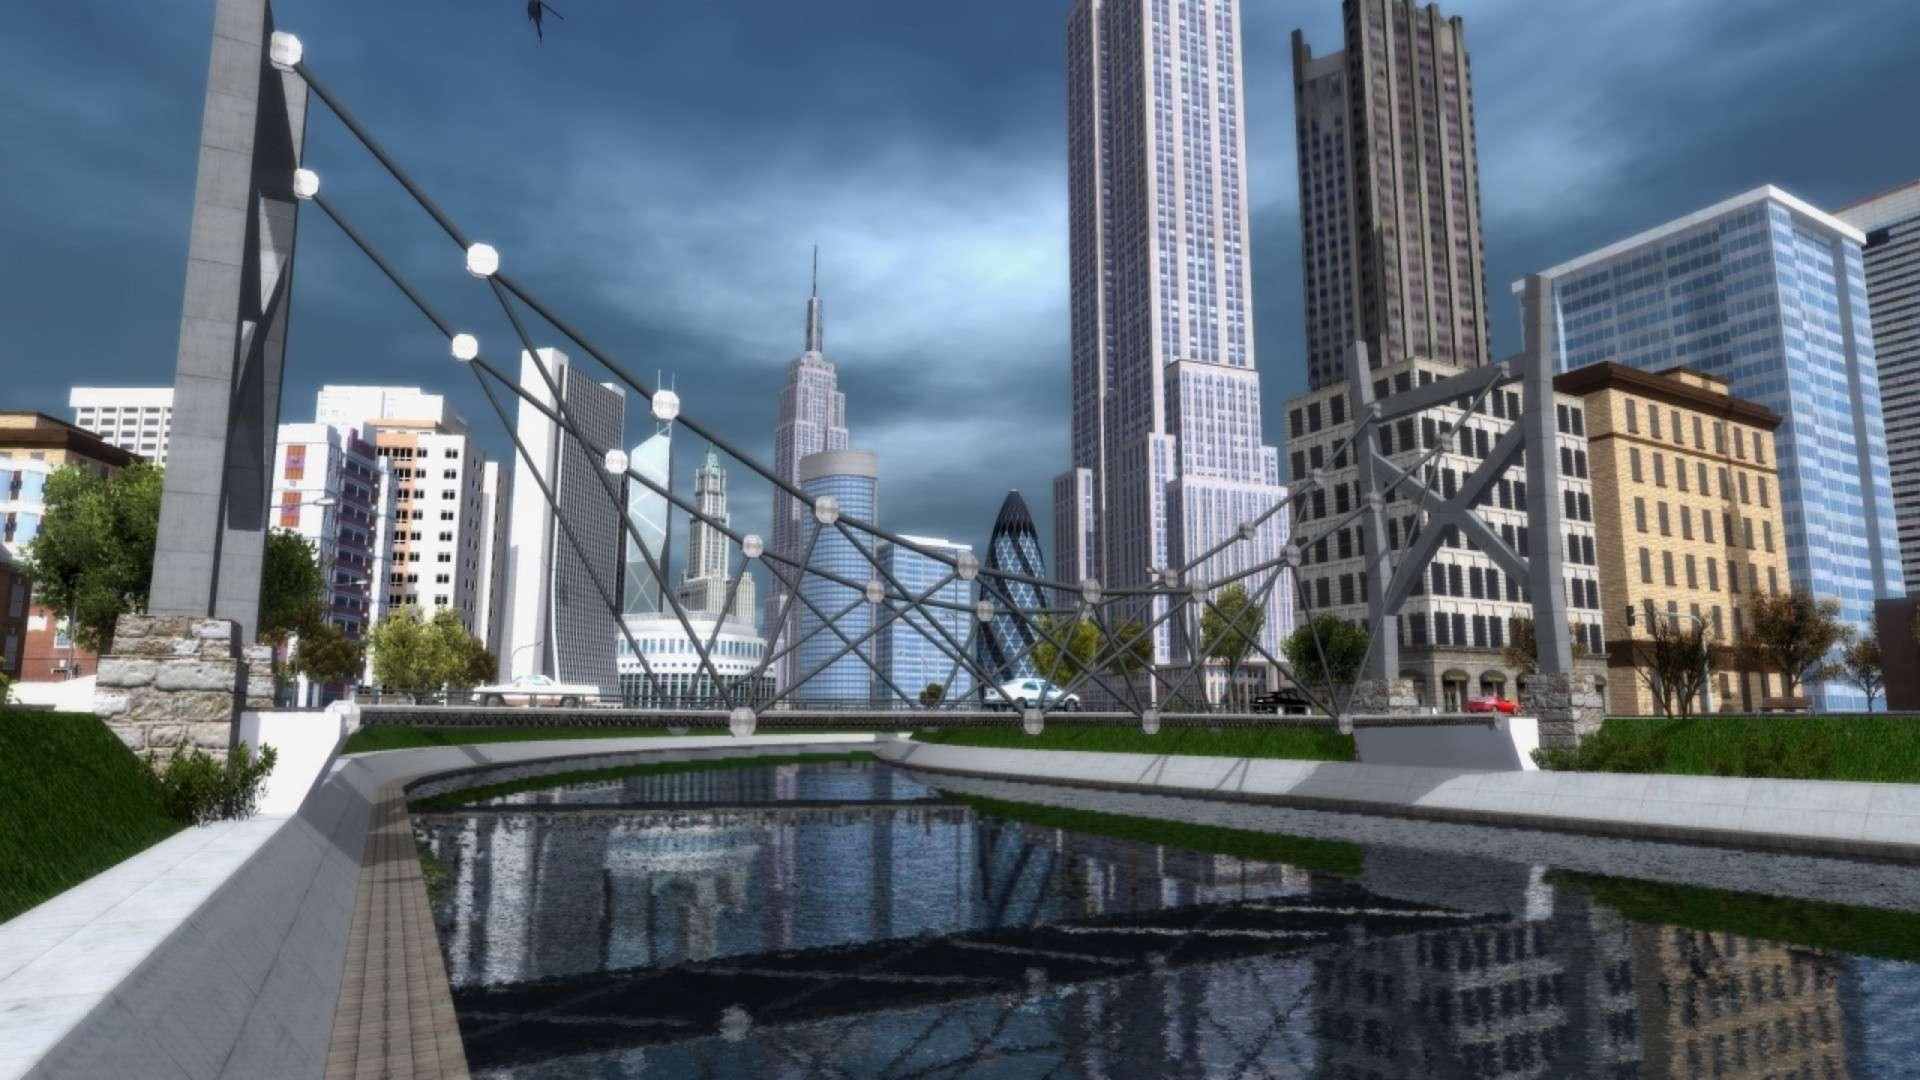 bridgeproject01.jpg